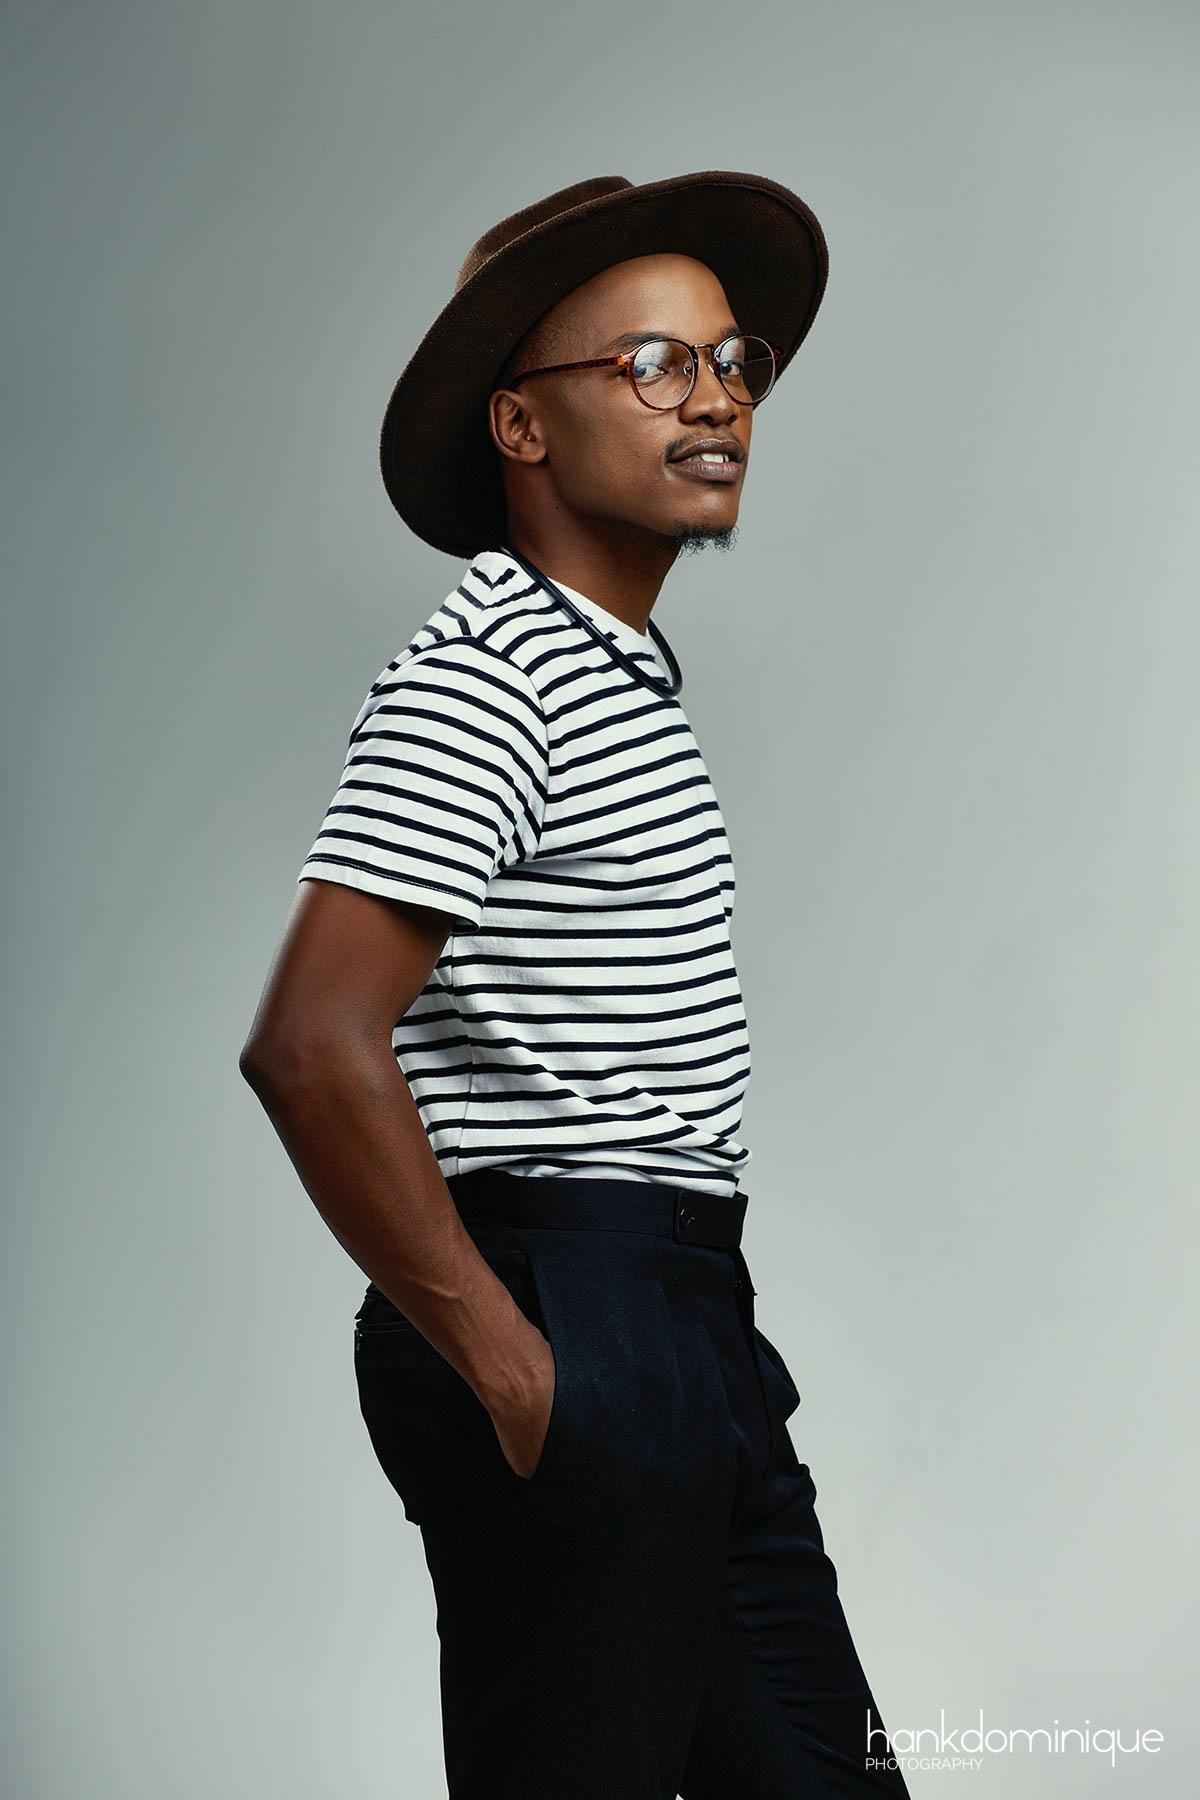 High Fashion Portraits by Hank Dominique